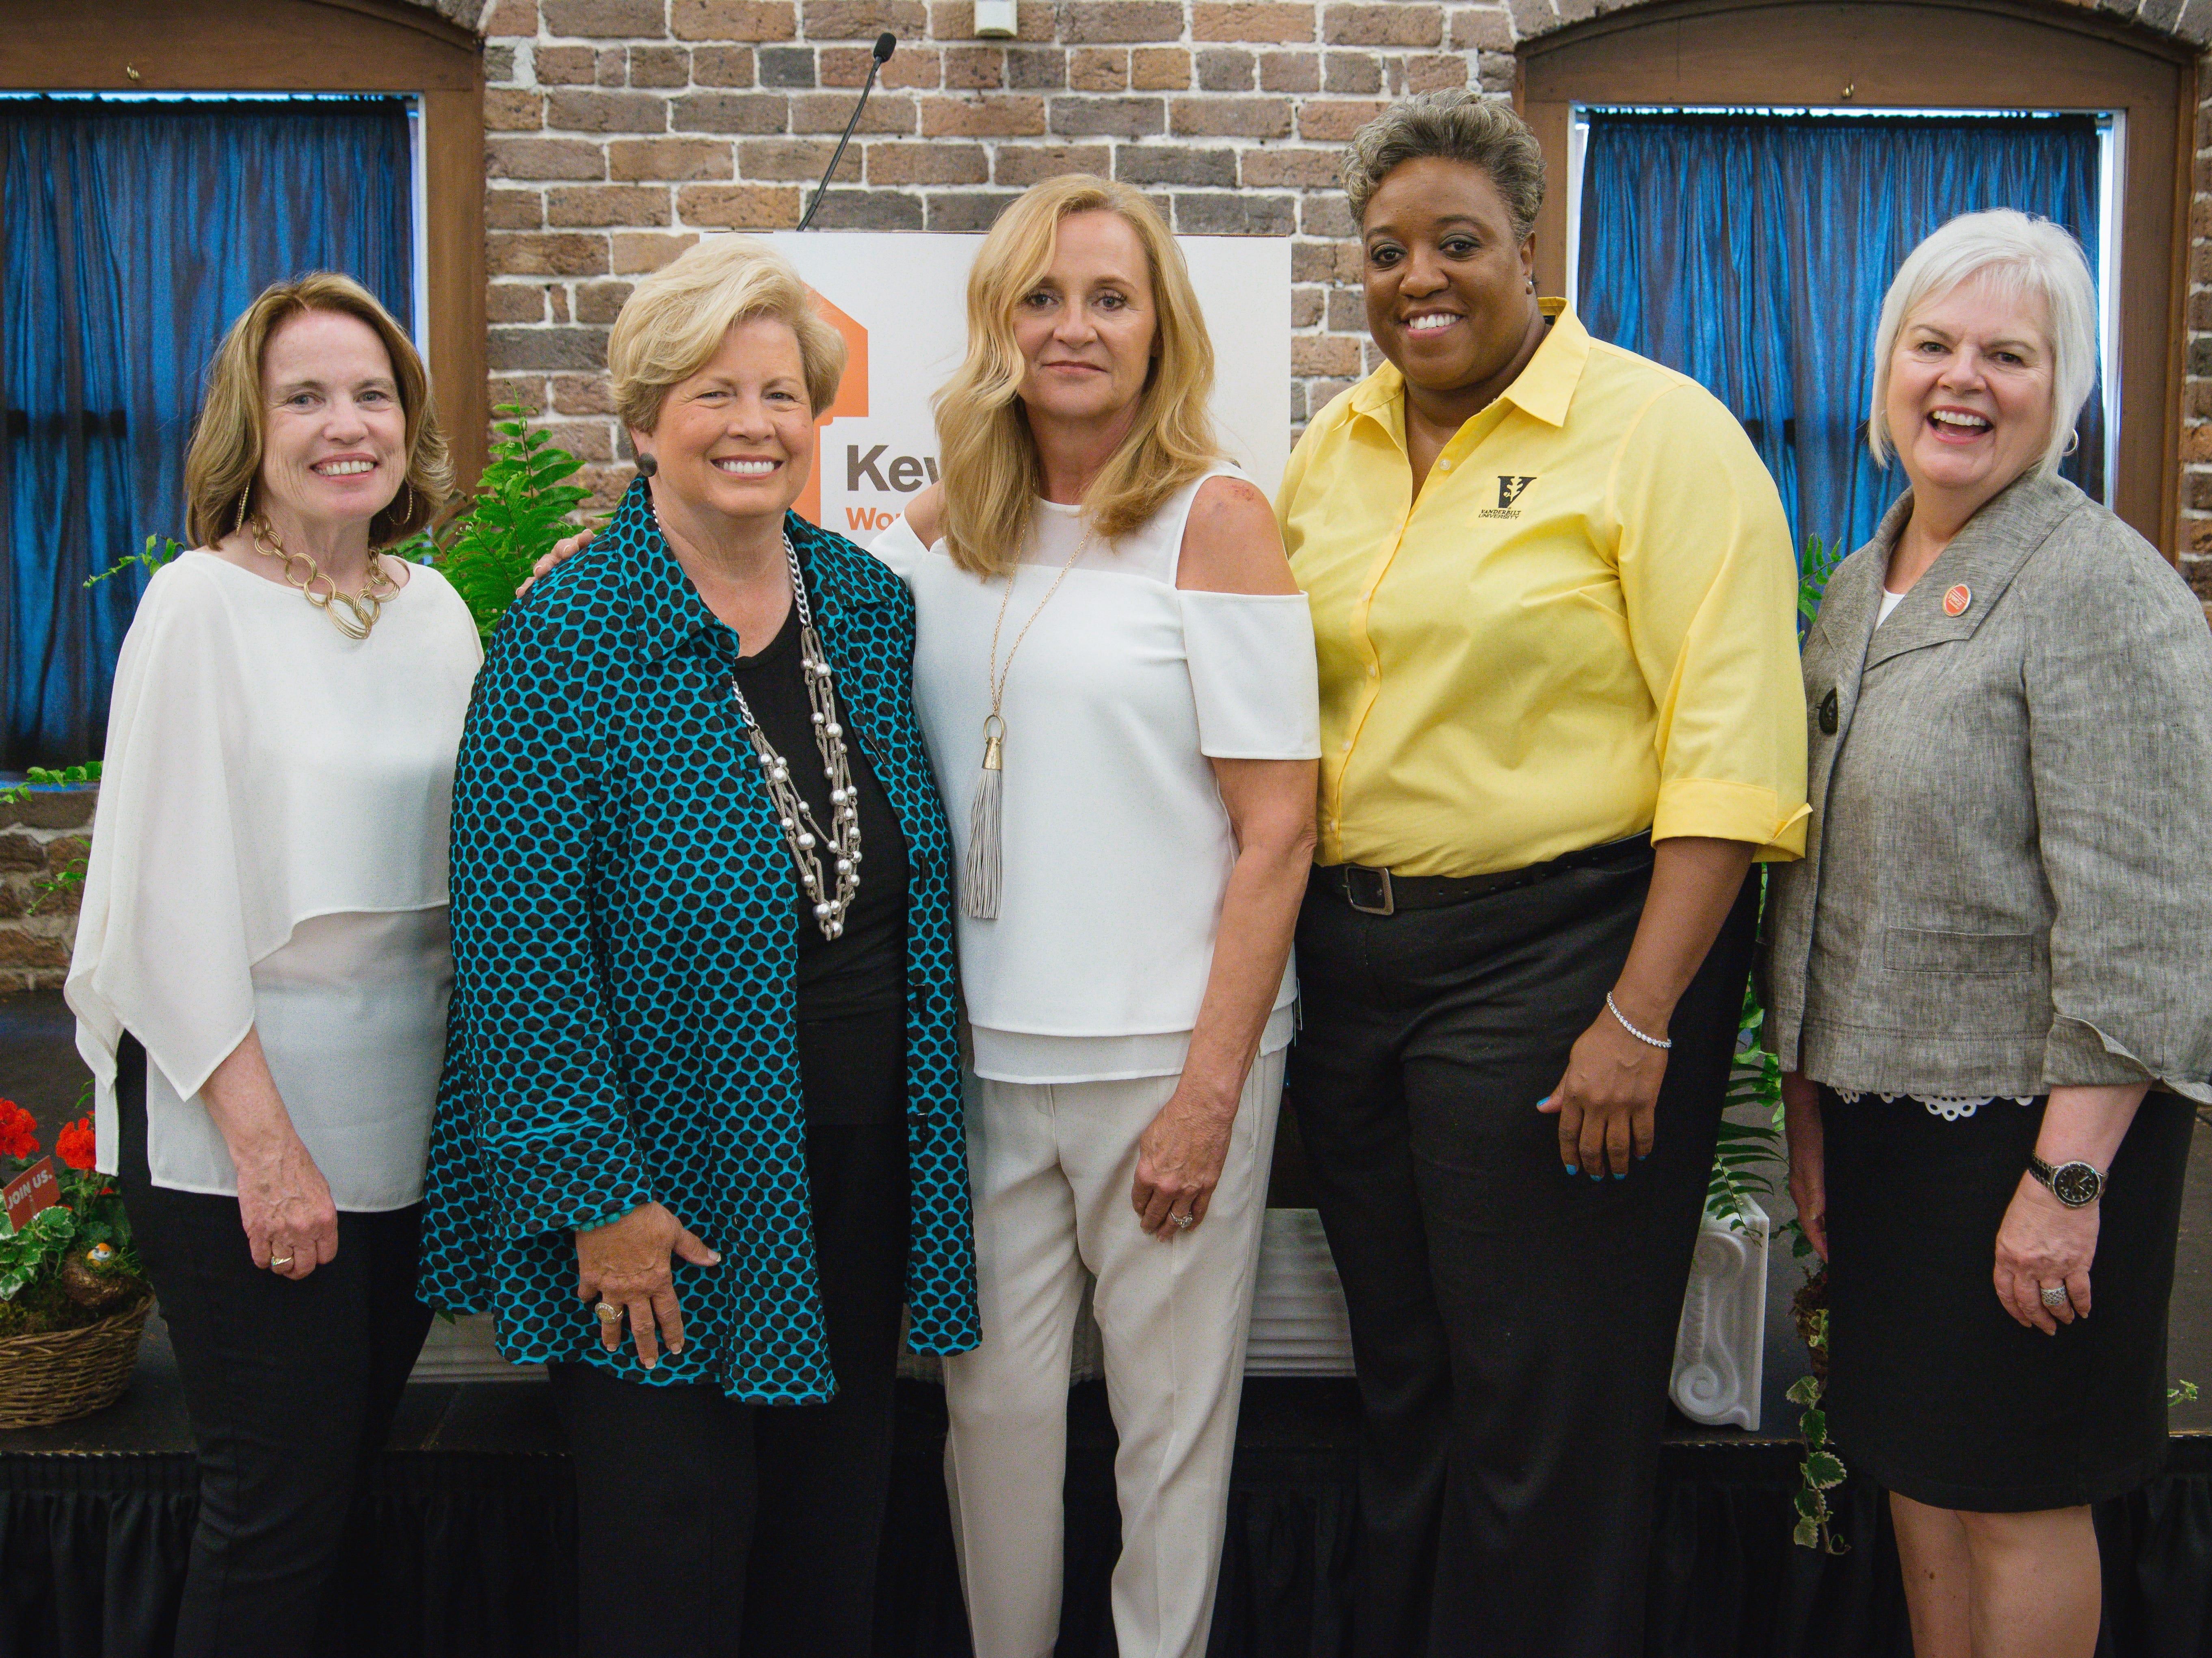 YWCA Knoxville CEO Marigail Mullin, Joan Cronan, Keys of Hope presenting sponsor Nancy Land, Meshia Thomas and YWCA Board of Directors President Debbie Stevens.